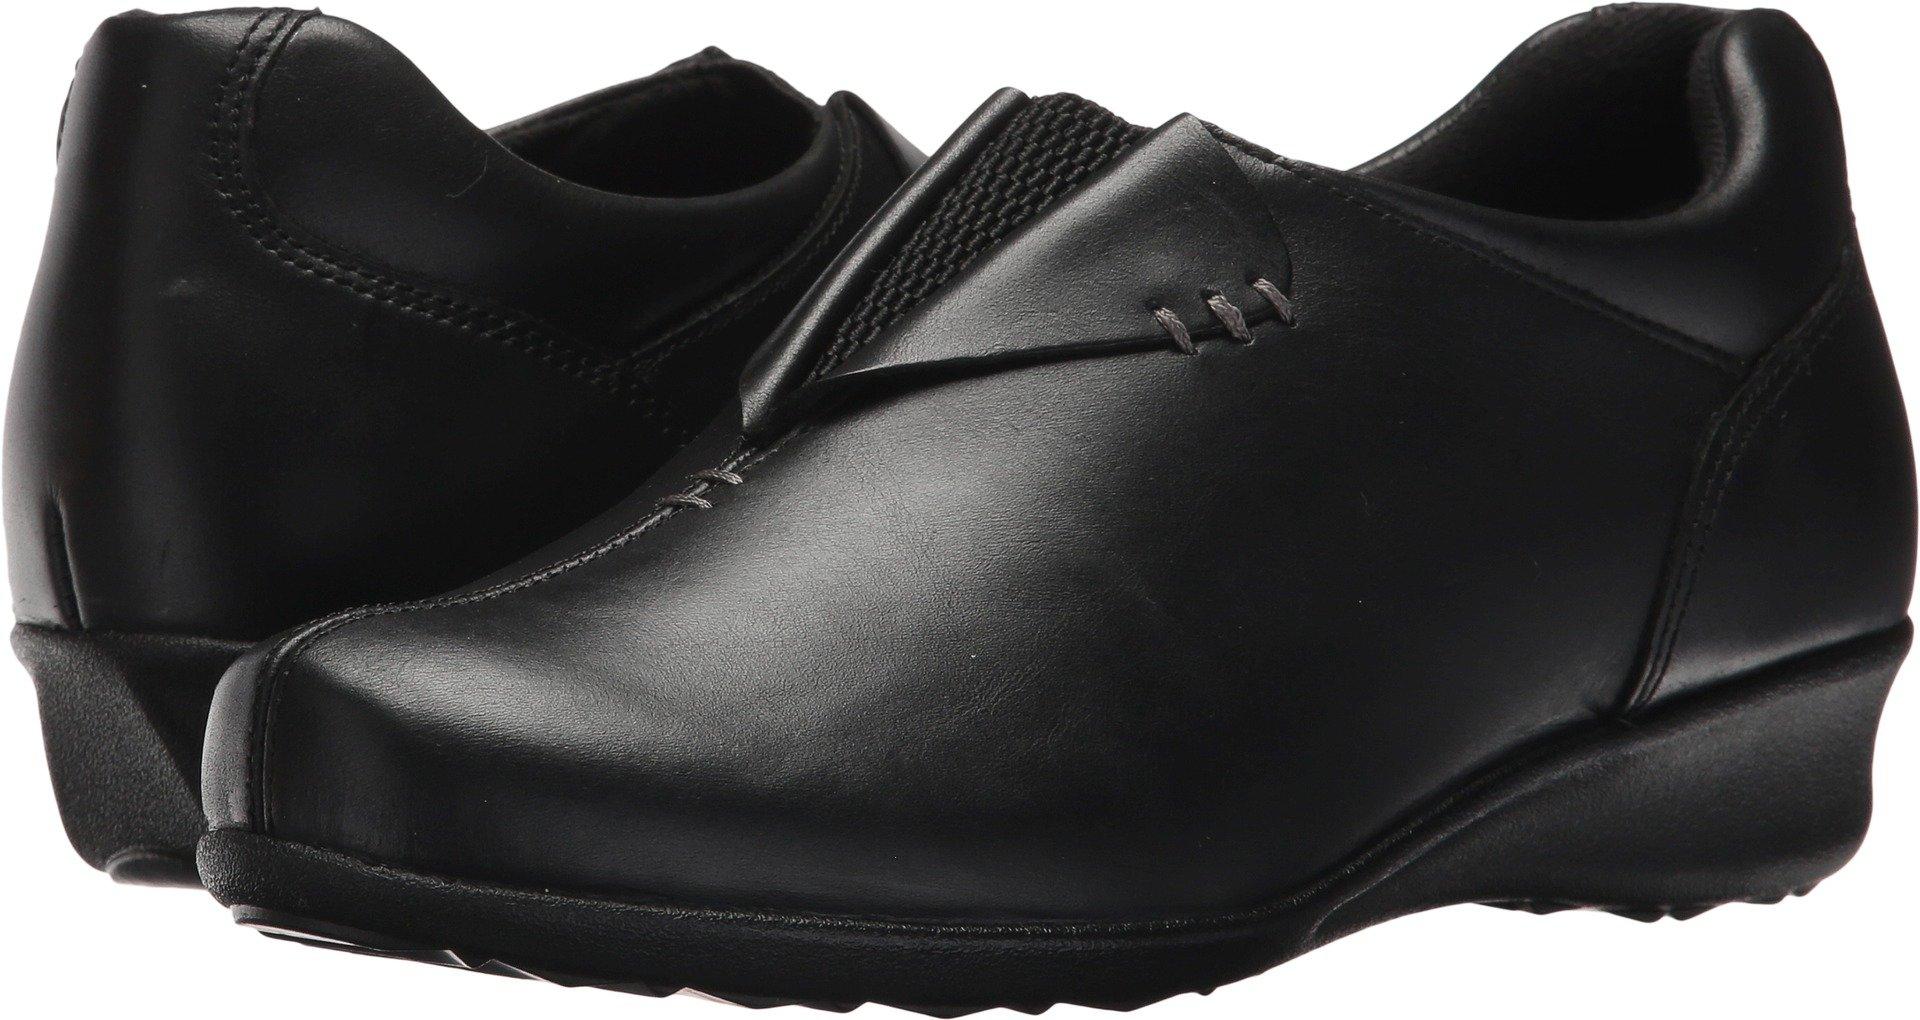 Drew Shoe Naples Women's Therapeutic Diabetic Extra Depth Shoe: Black 8.5 X-Wide (2E) Slip-On